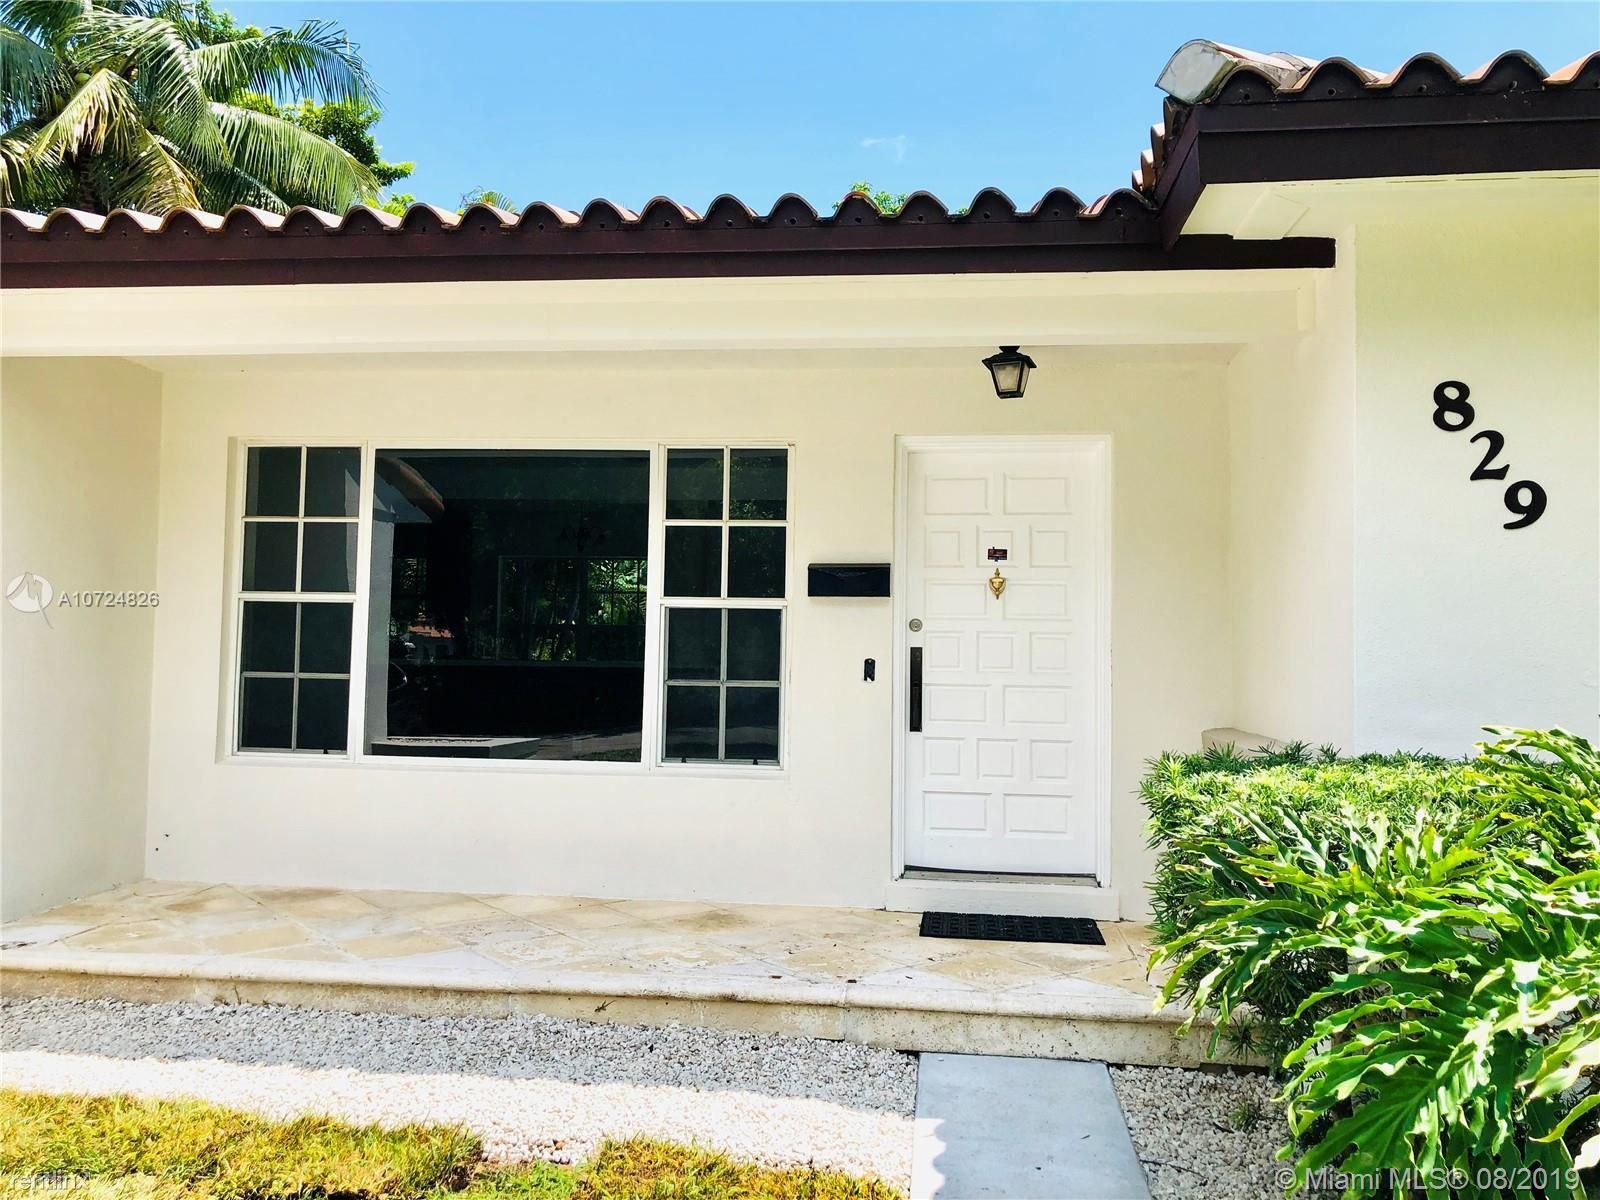 829 Columbus Blvd, Coral Gables, FL - $4,000